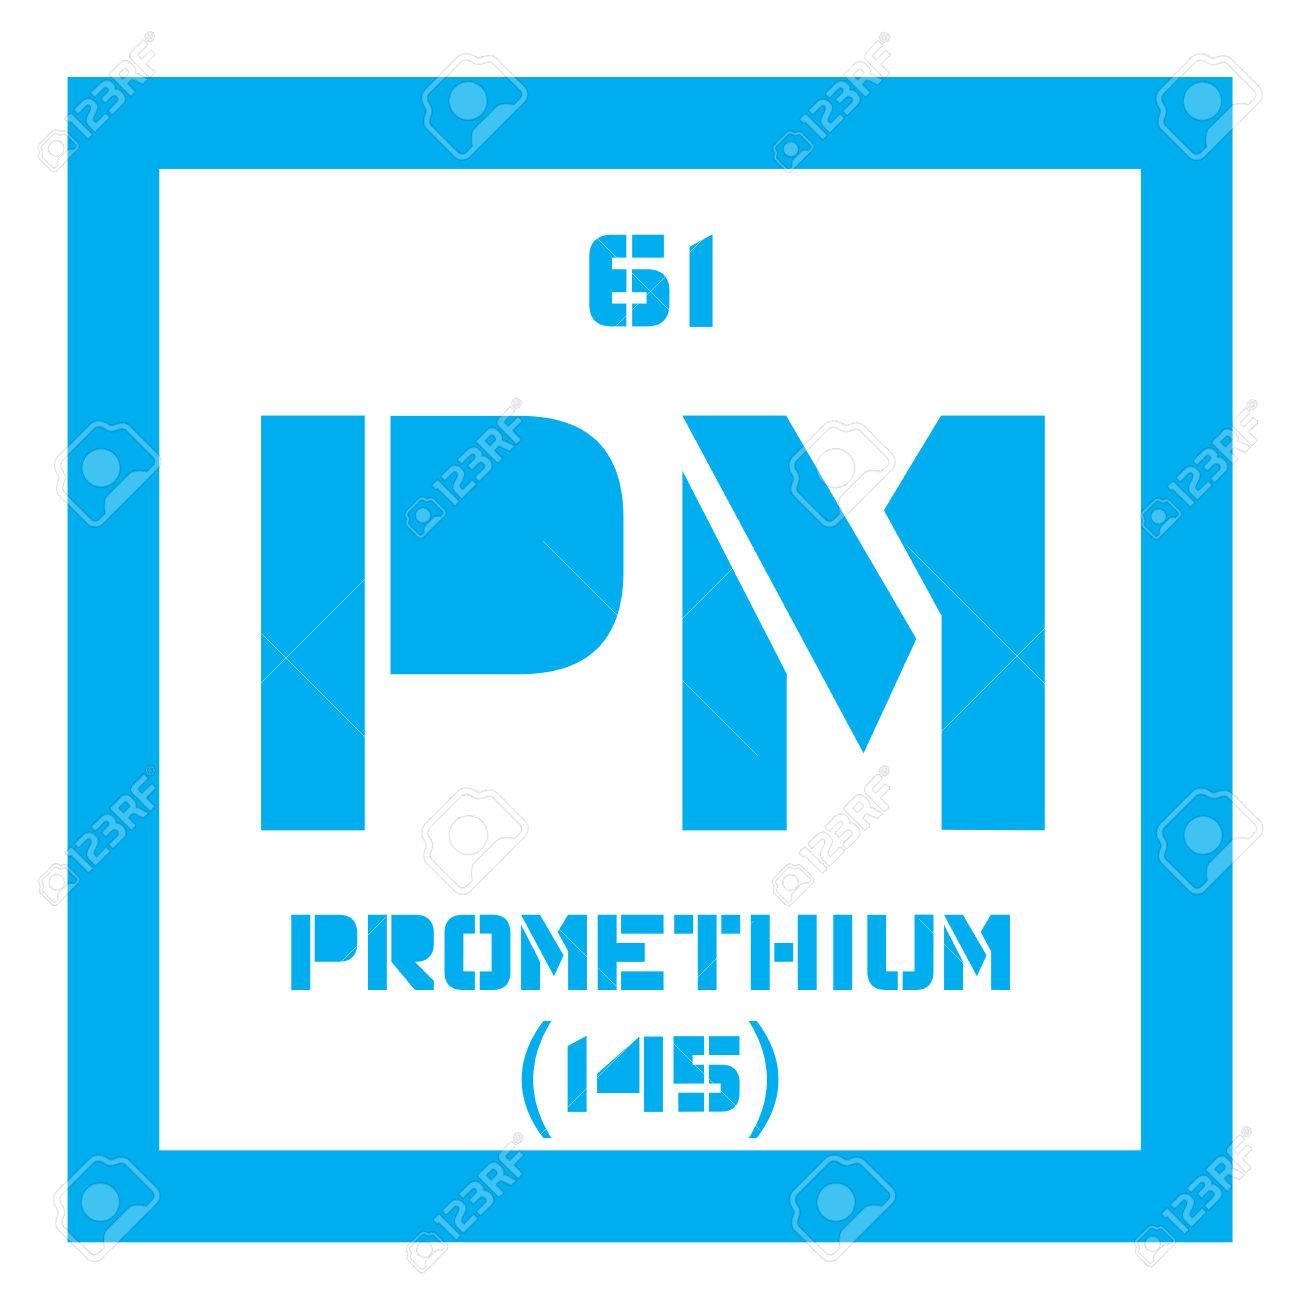 Promethium chemical element radioactive element colored icon promethium chemical element radioactive element colored icon with atomic number and atomic weight urtaz Gallery